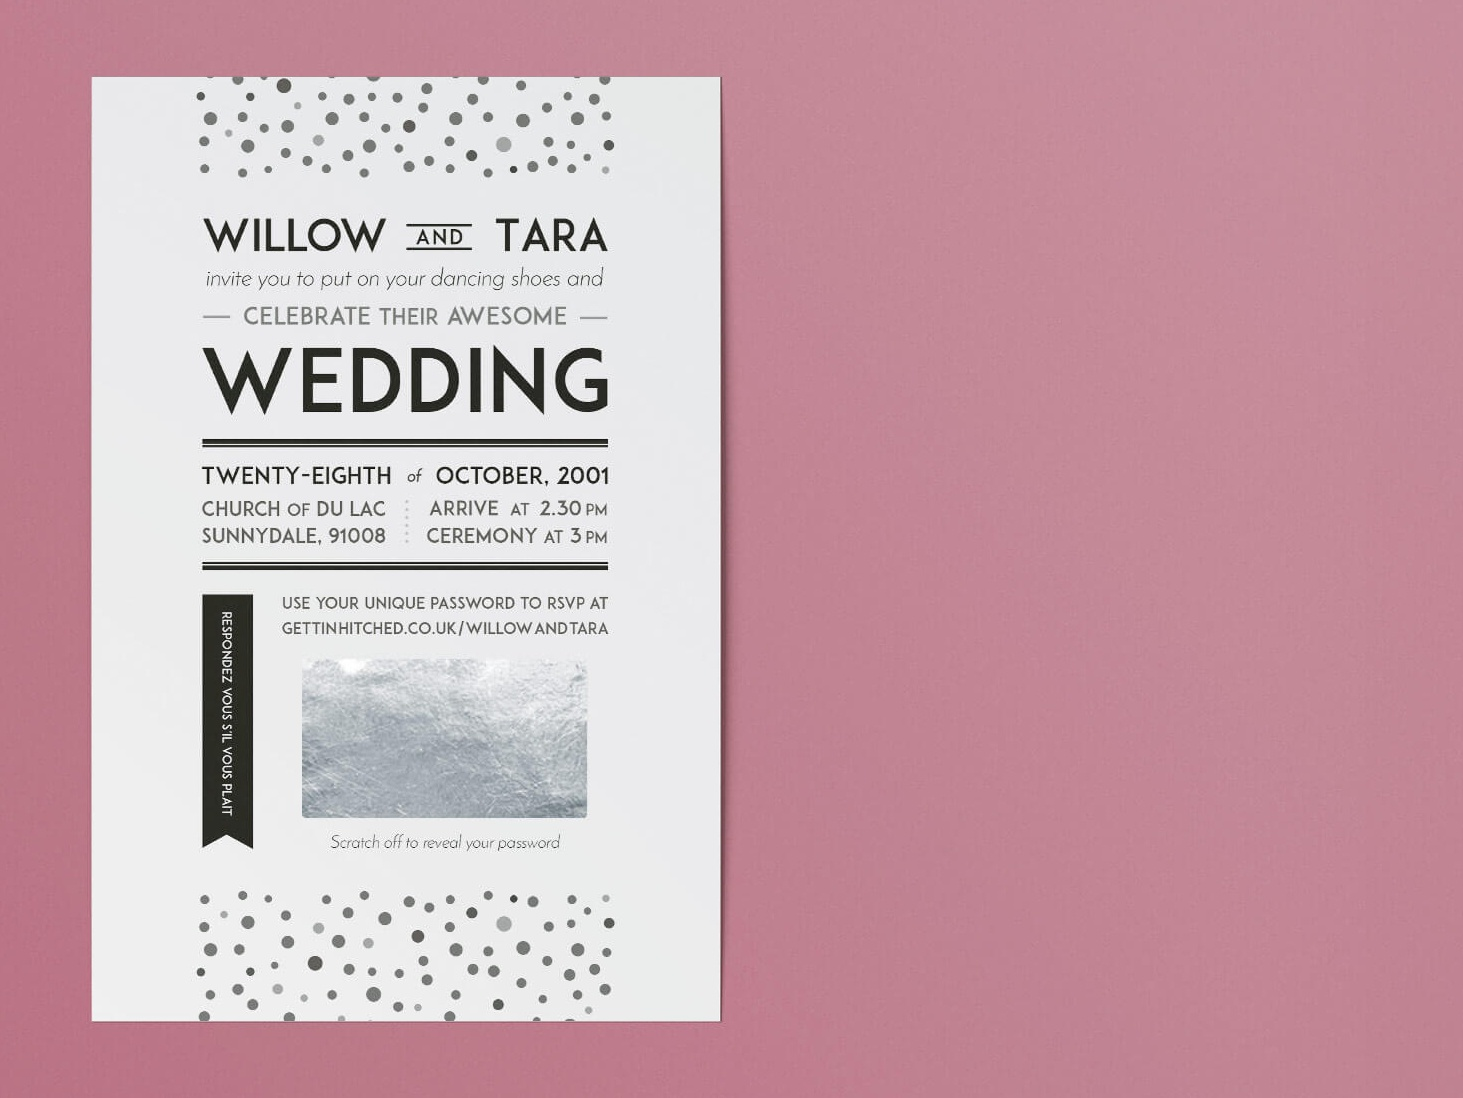 1920s-inspired wedding invitation gettin hitched rocks clean polka dot minimal elegant vintage 1920s black and white wedding invitation invitation